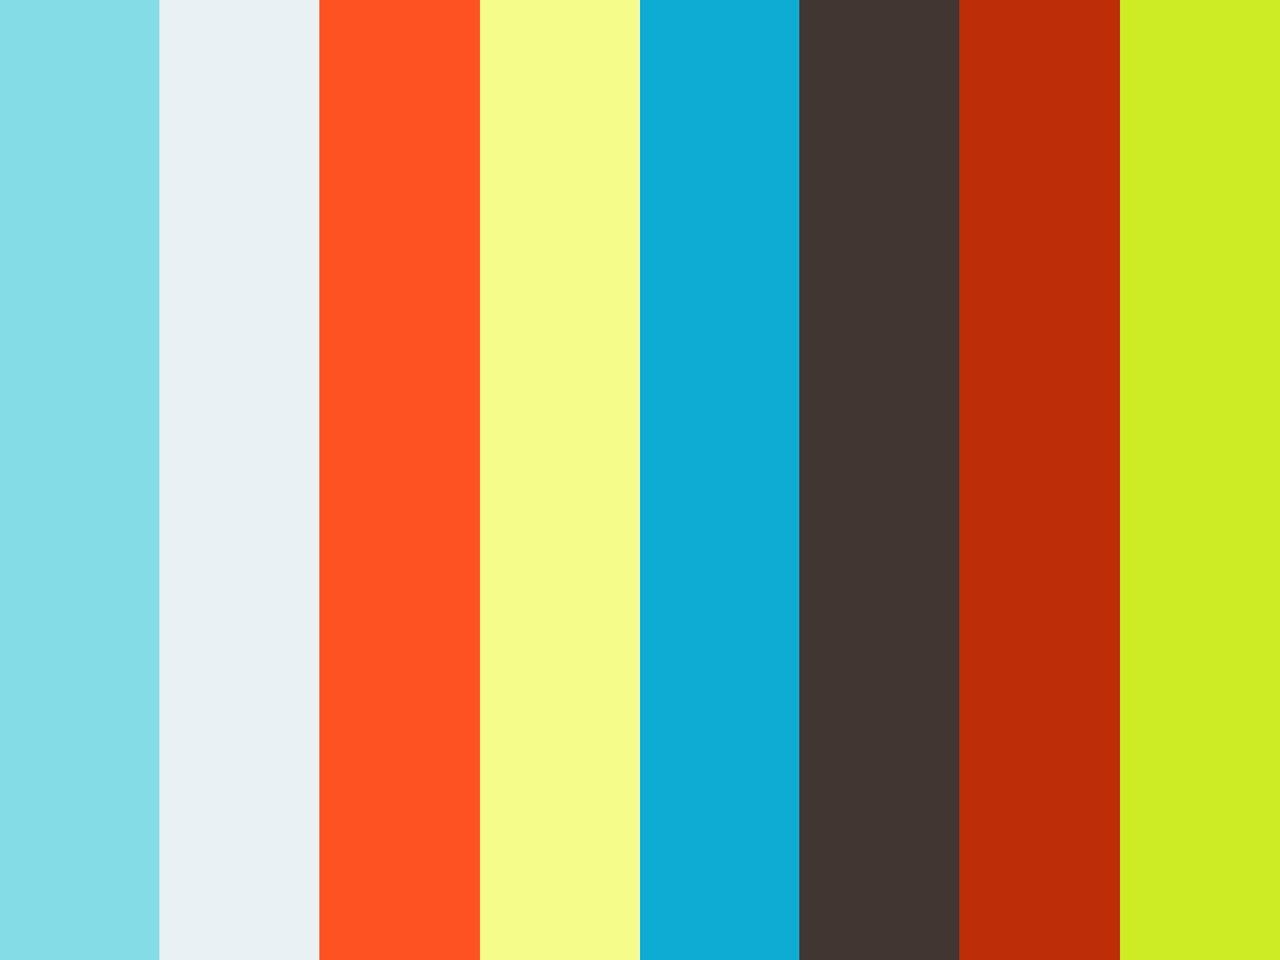 SERVE - Theme Interpretation by Randy Norris